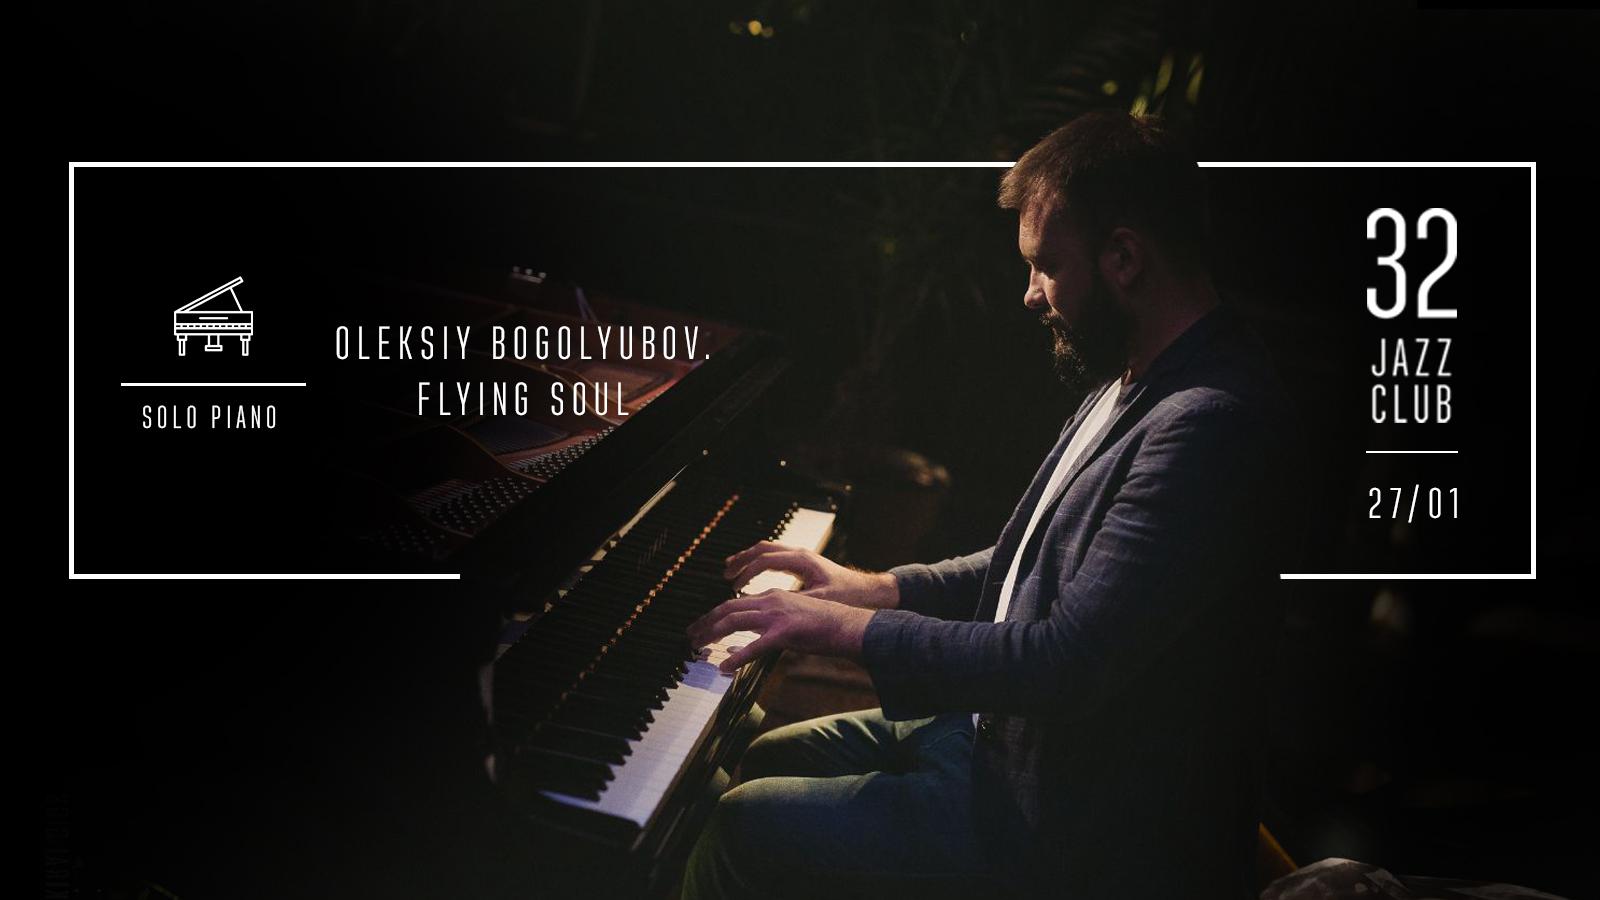 Solo Piano. Oleksiy Bogolyubov